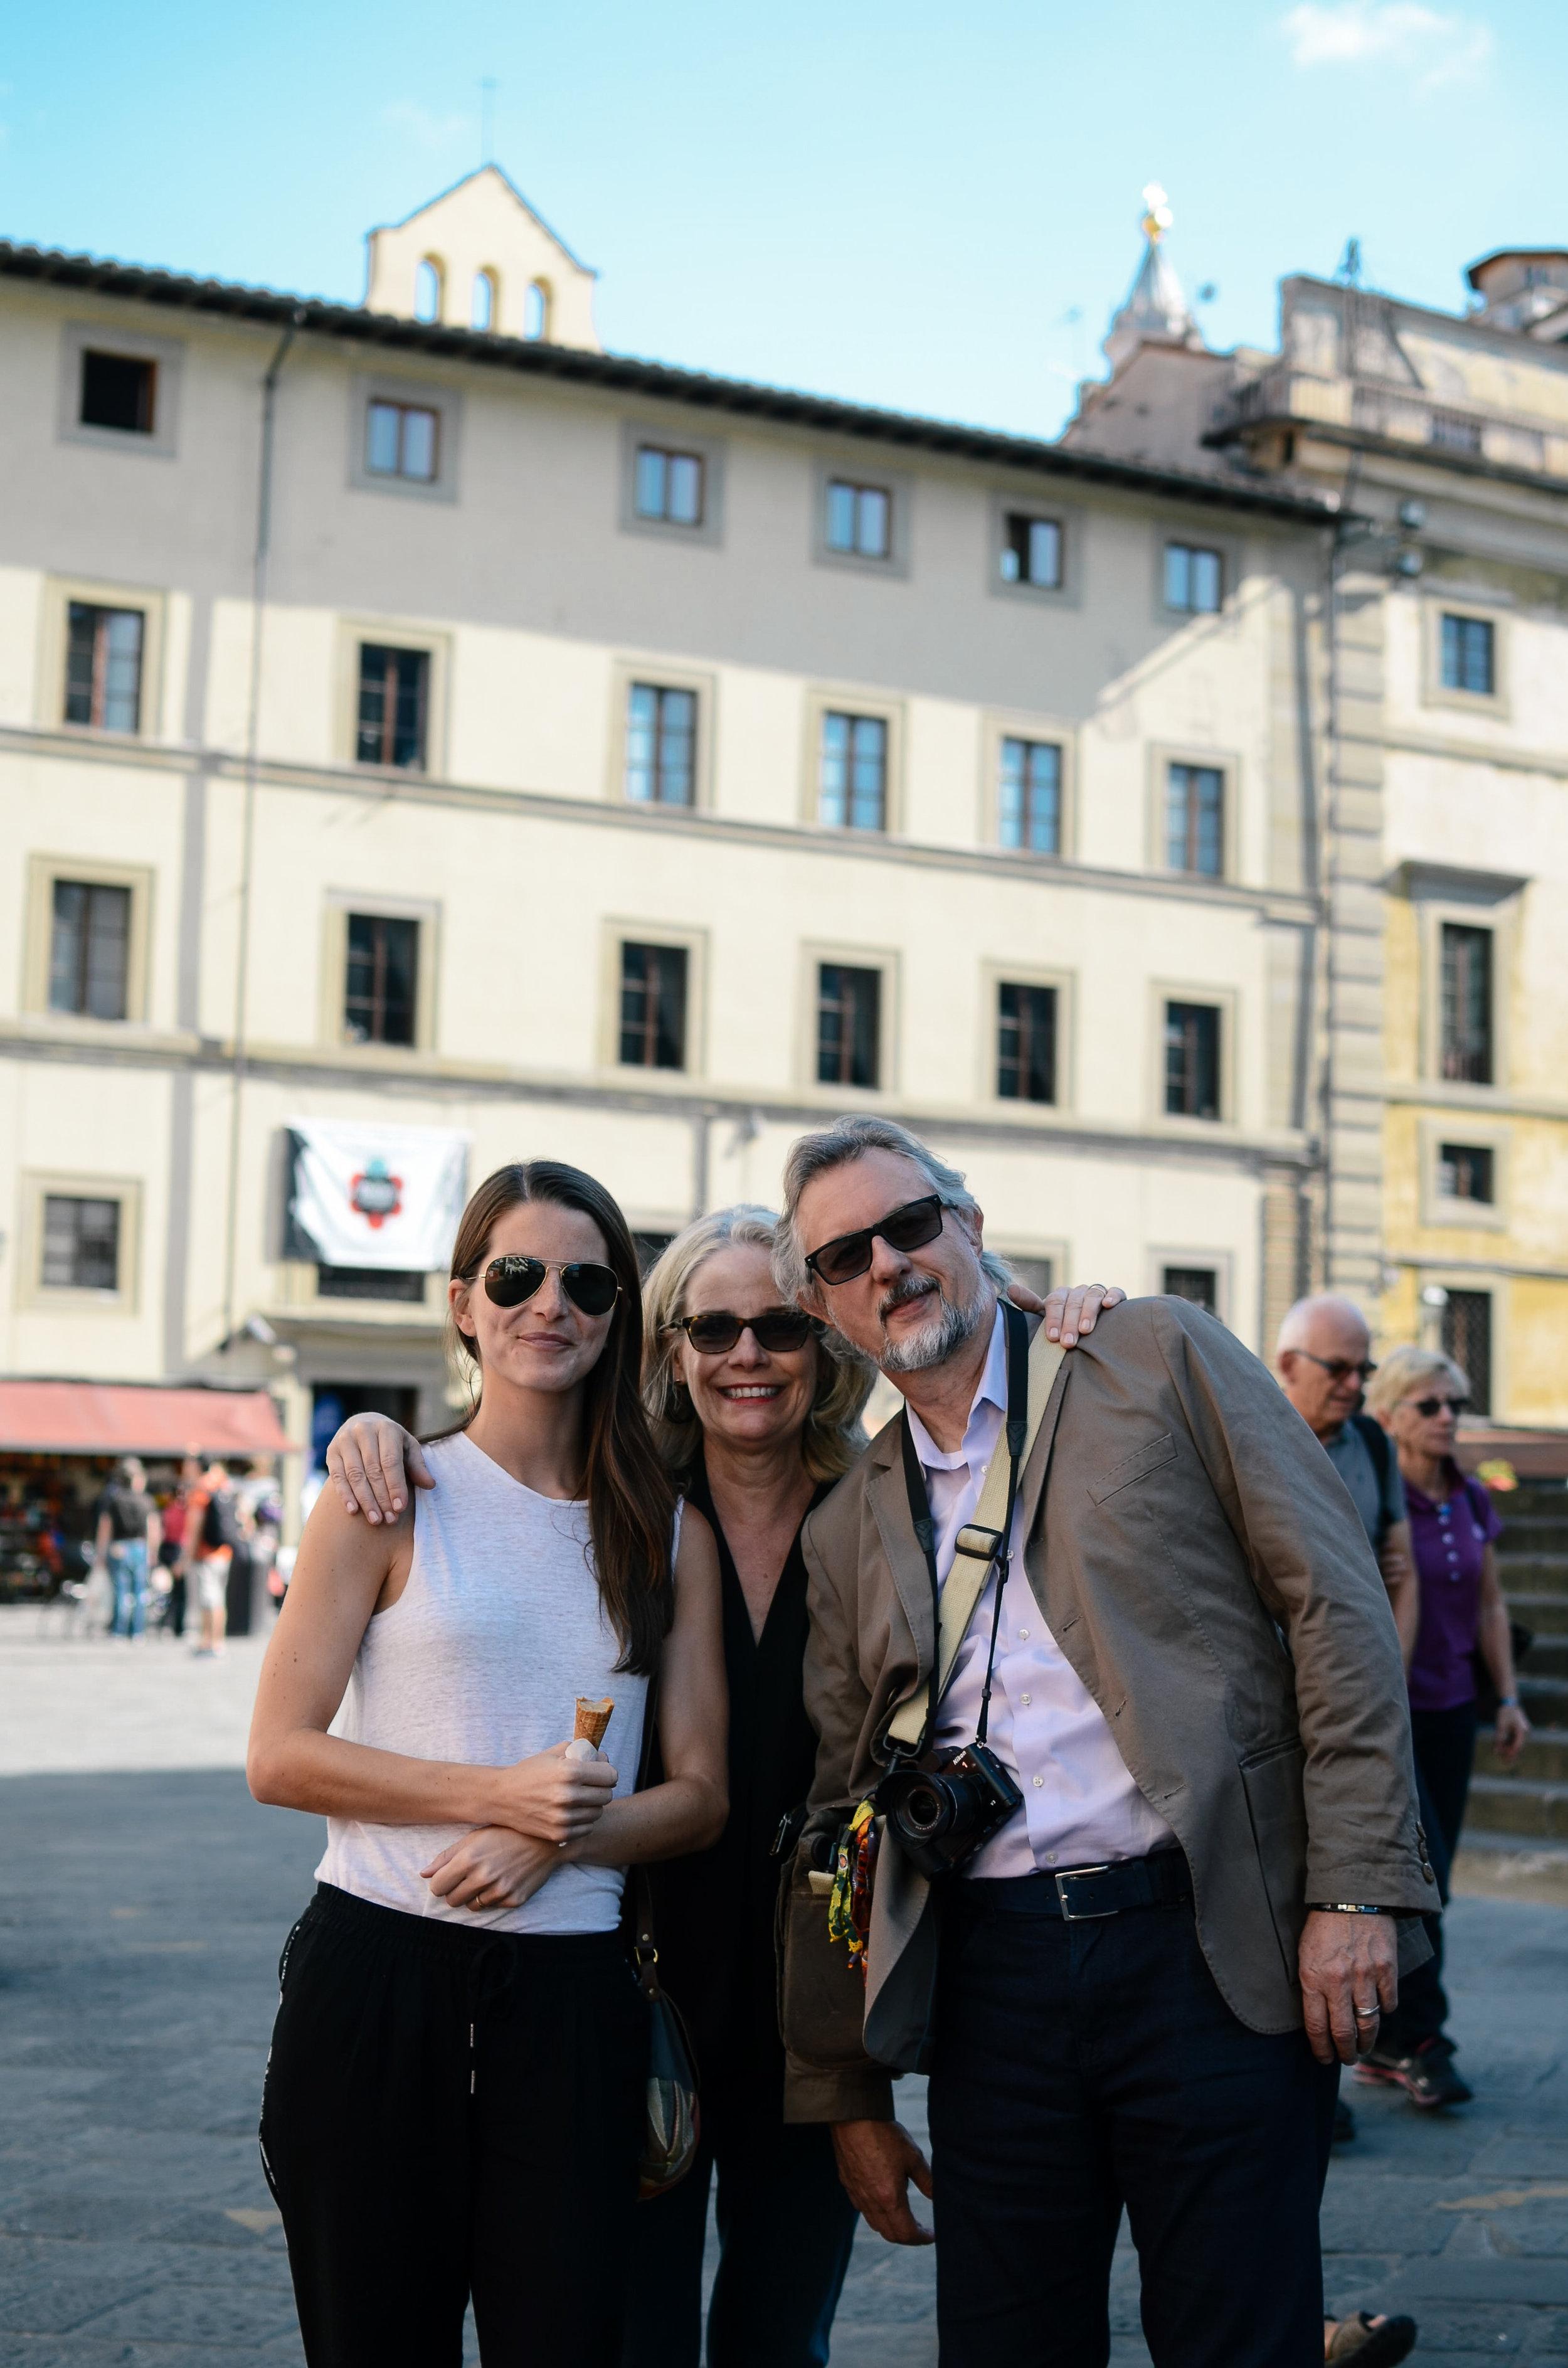 florence-italy-travel-guide-adventure-blog_DSC_0164.jpg